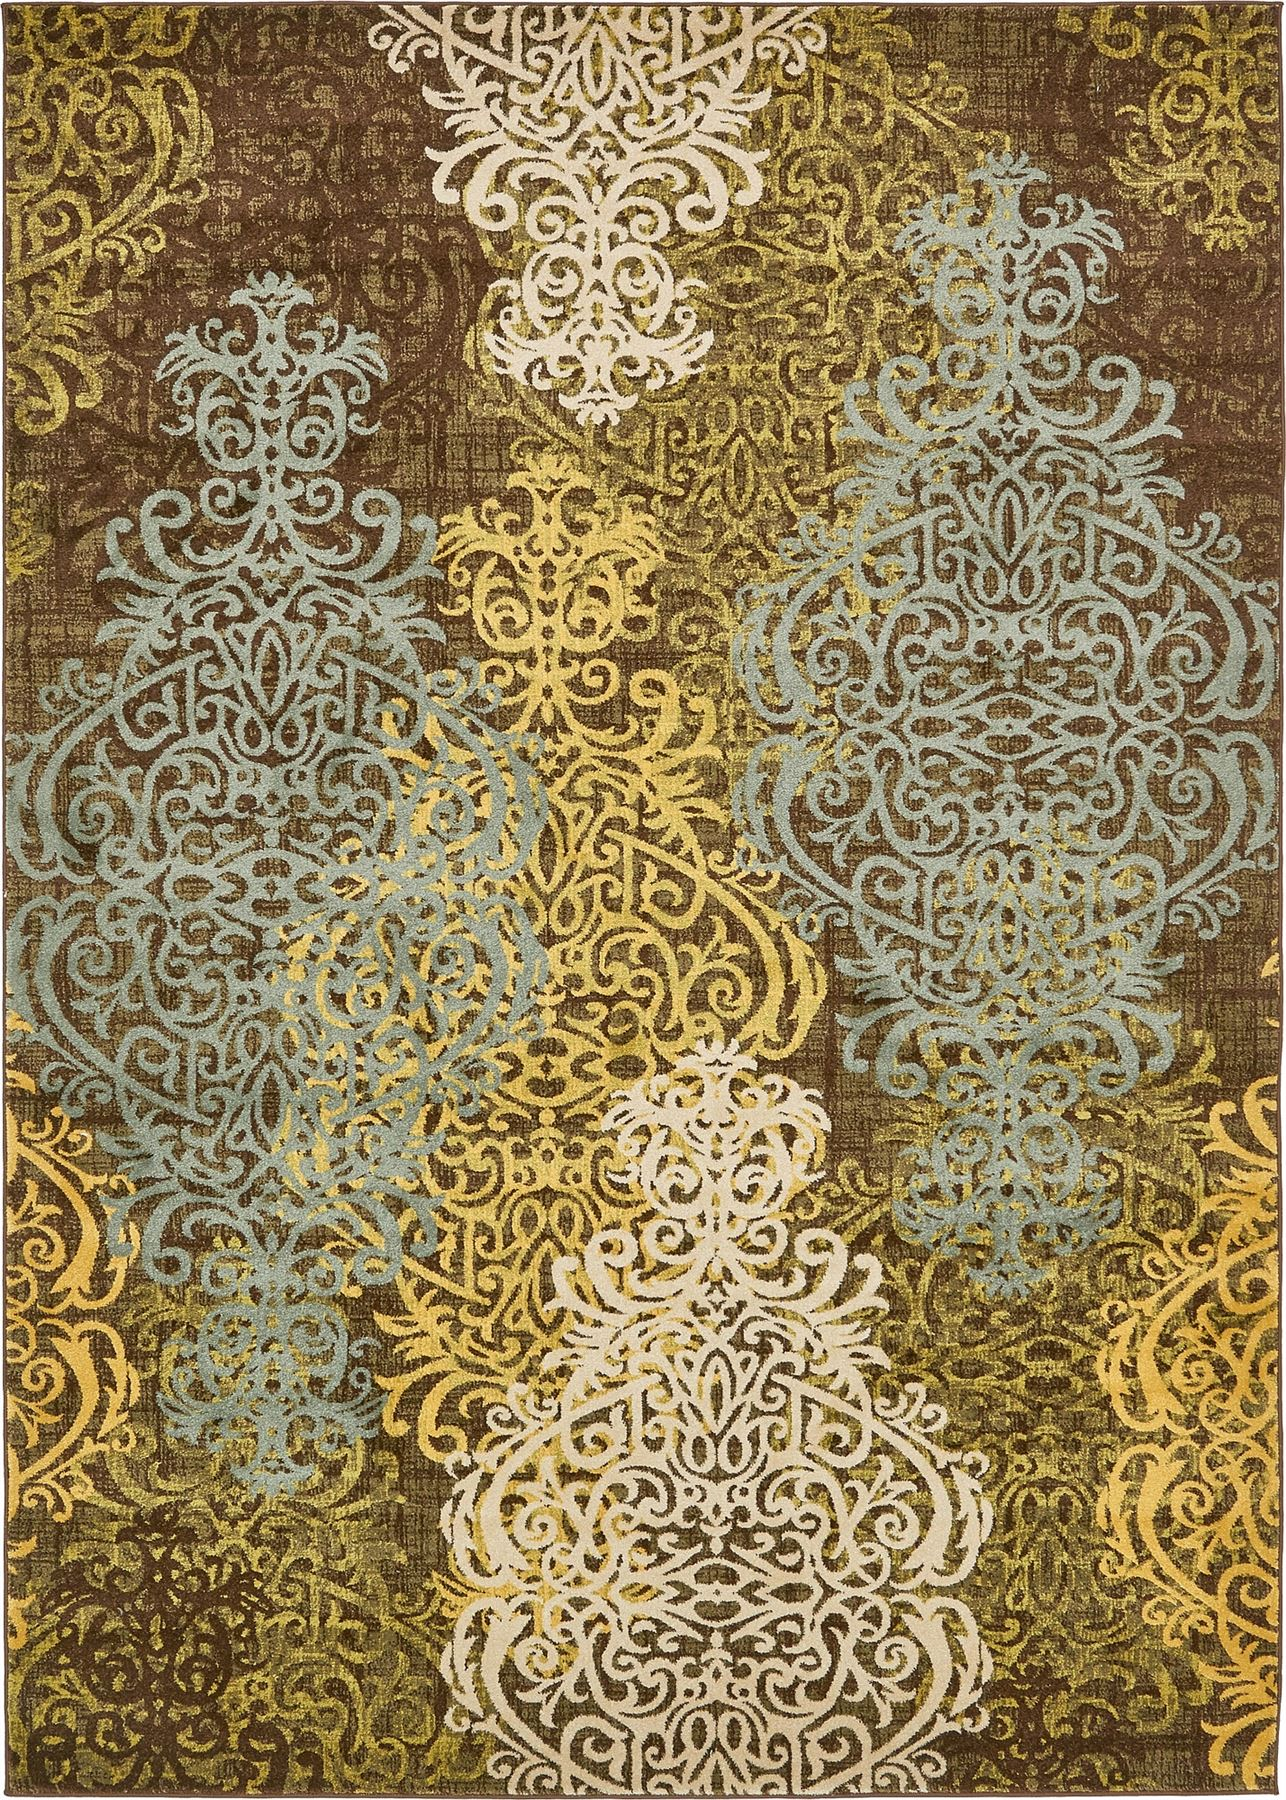 carpet flooring area rug floor decor modern large rugs. Black Bedroom Furniture Sets. Home Design Ideas